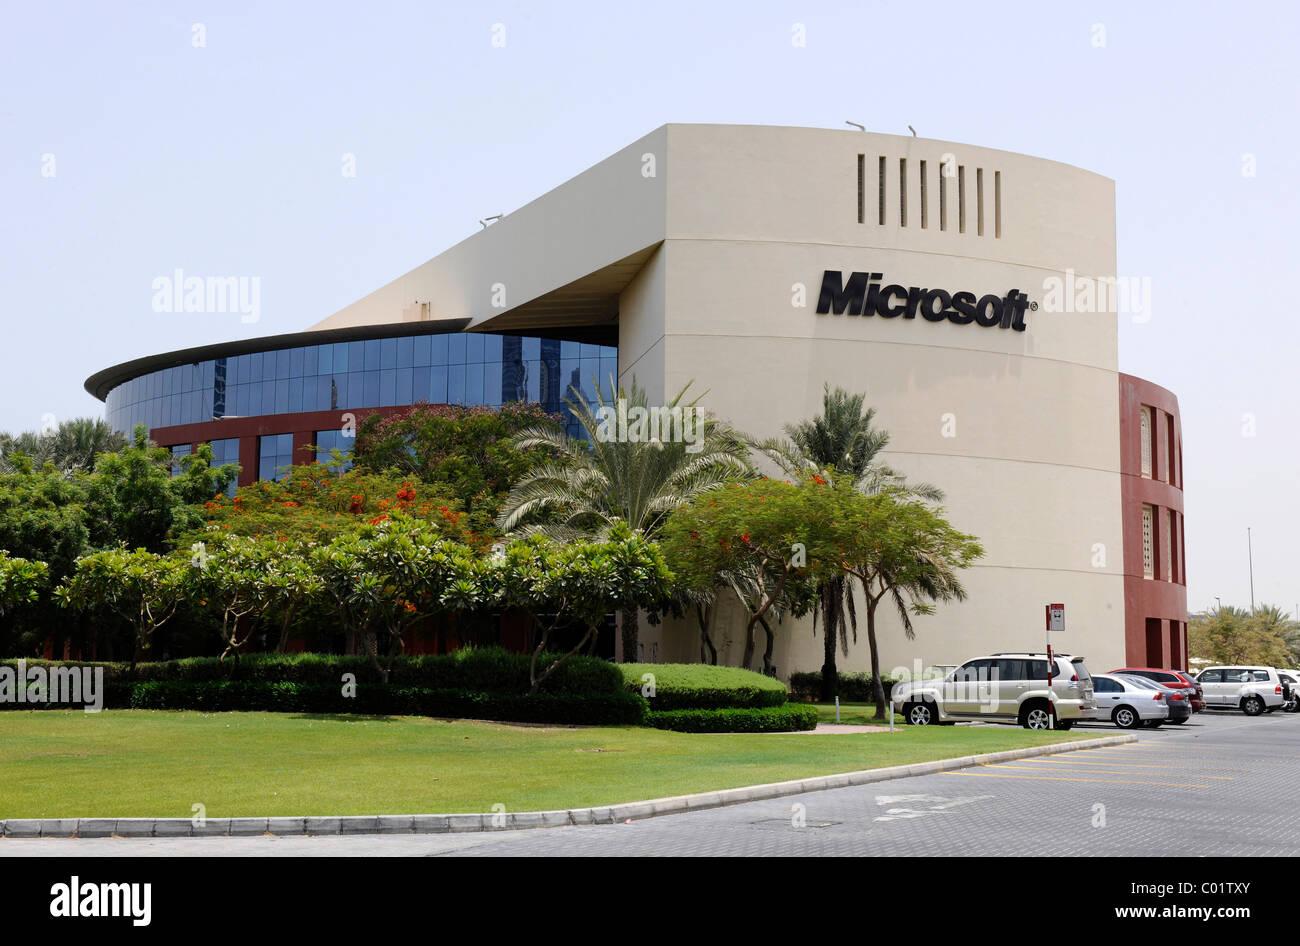 Building 92 microsoft store - Microsoft Building In Dubai Internet City Dubai United Arab Emirates Middle East